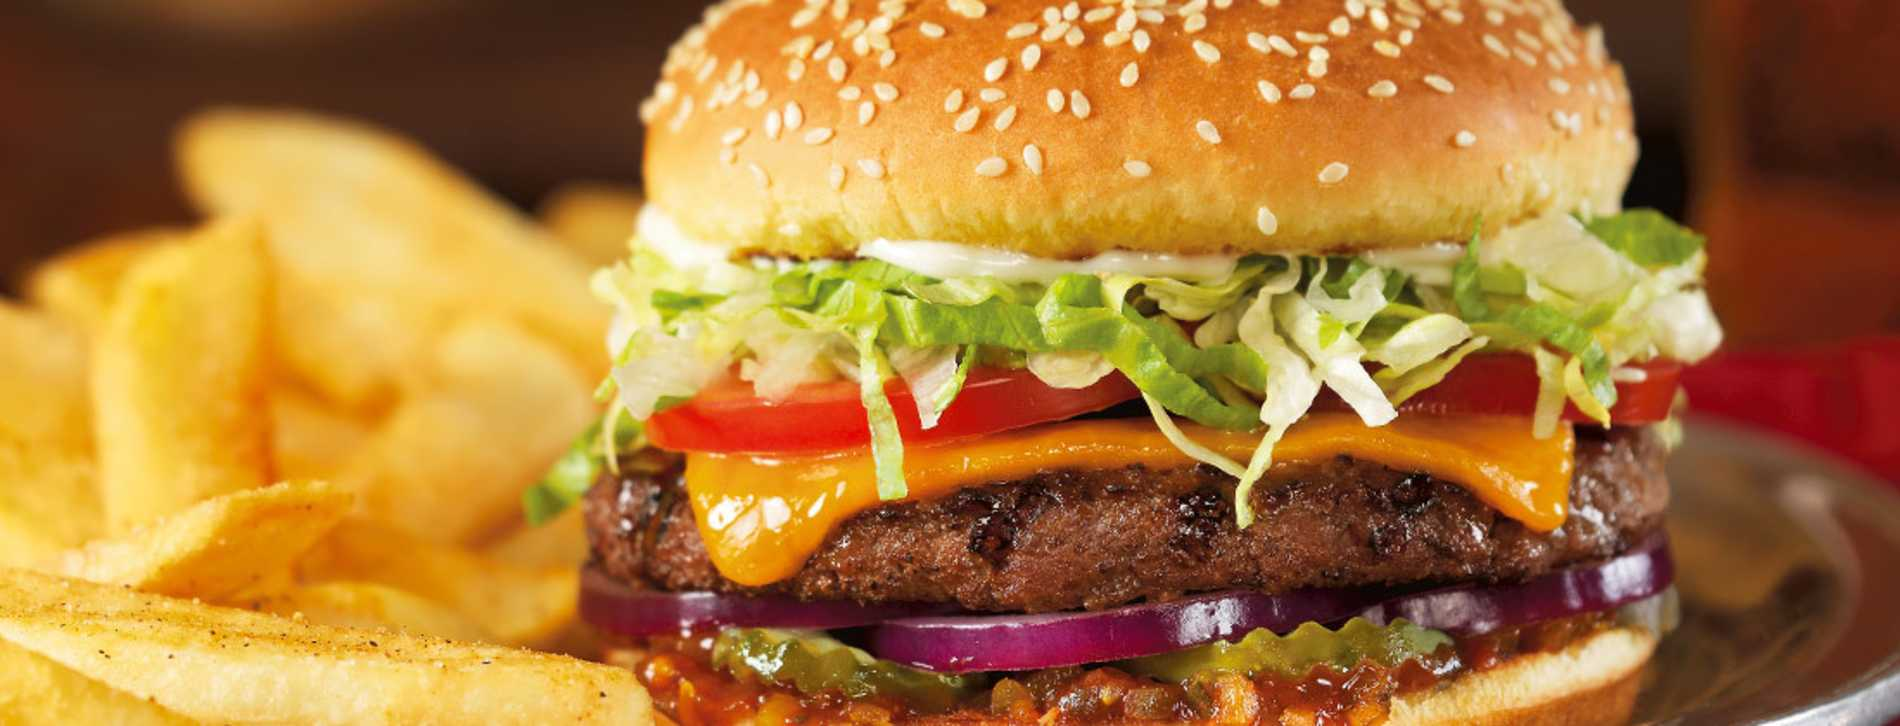 Red Robin Gourmet Burgers - Temecula